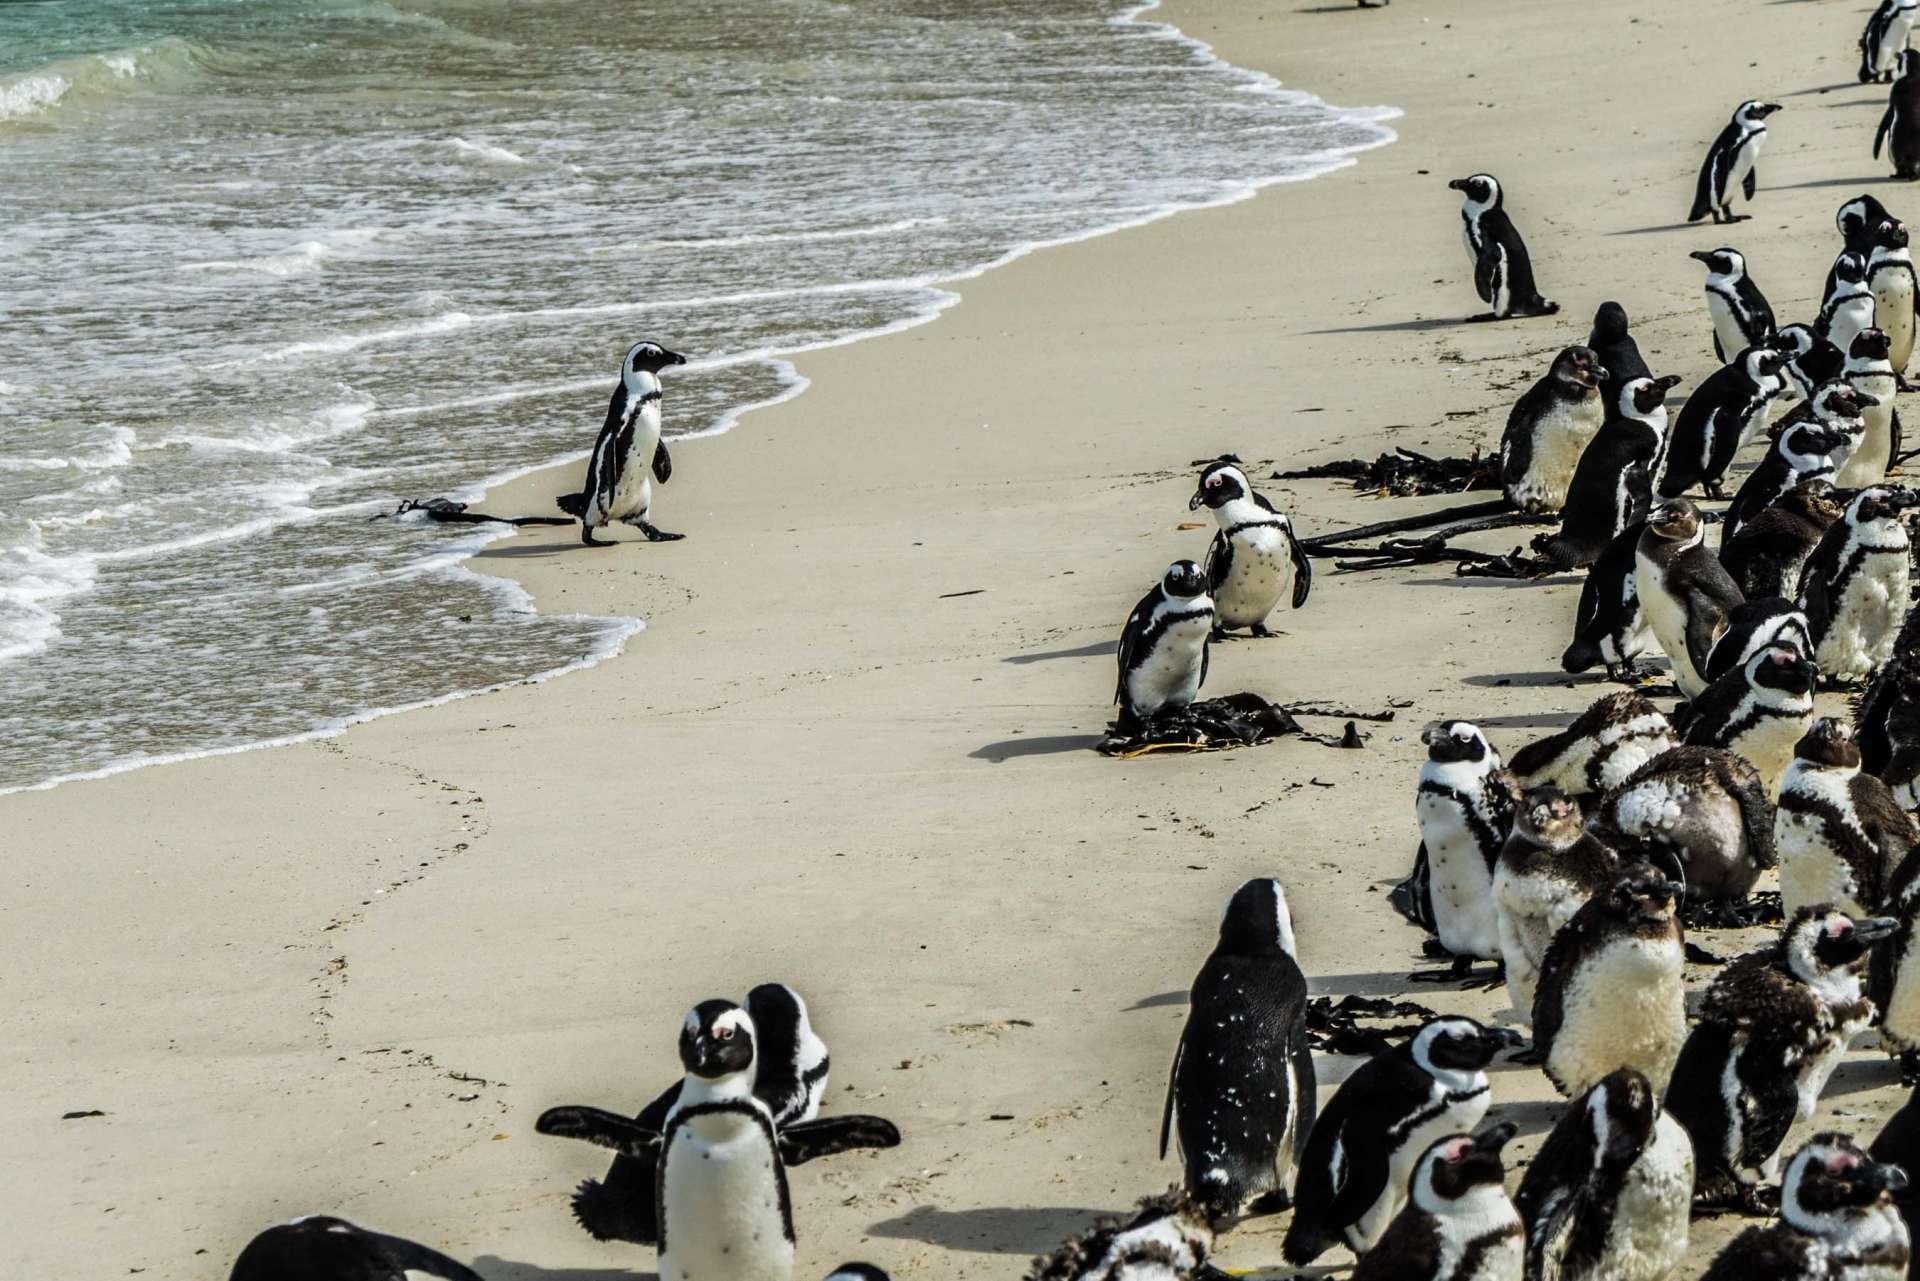 Cape Town Boulders Beach Pescart Enrico Pescantini 4